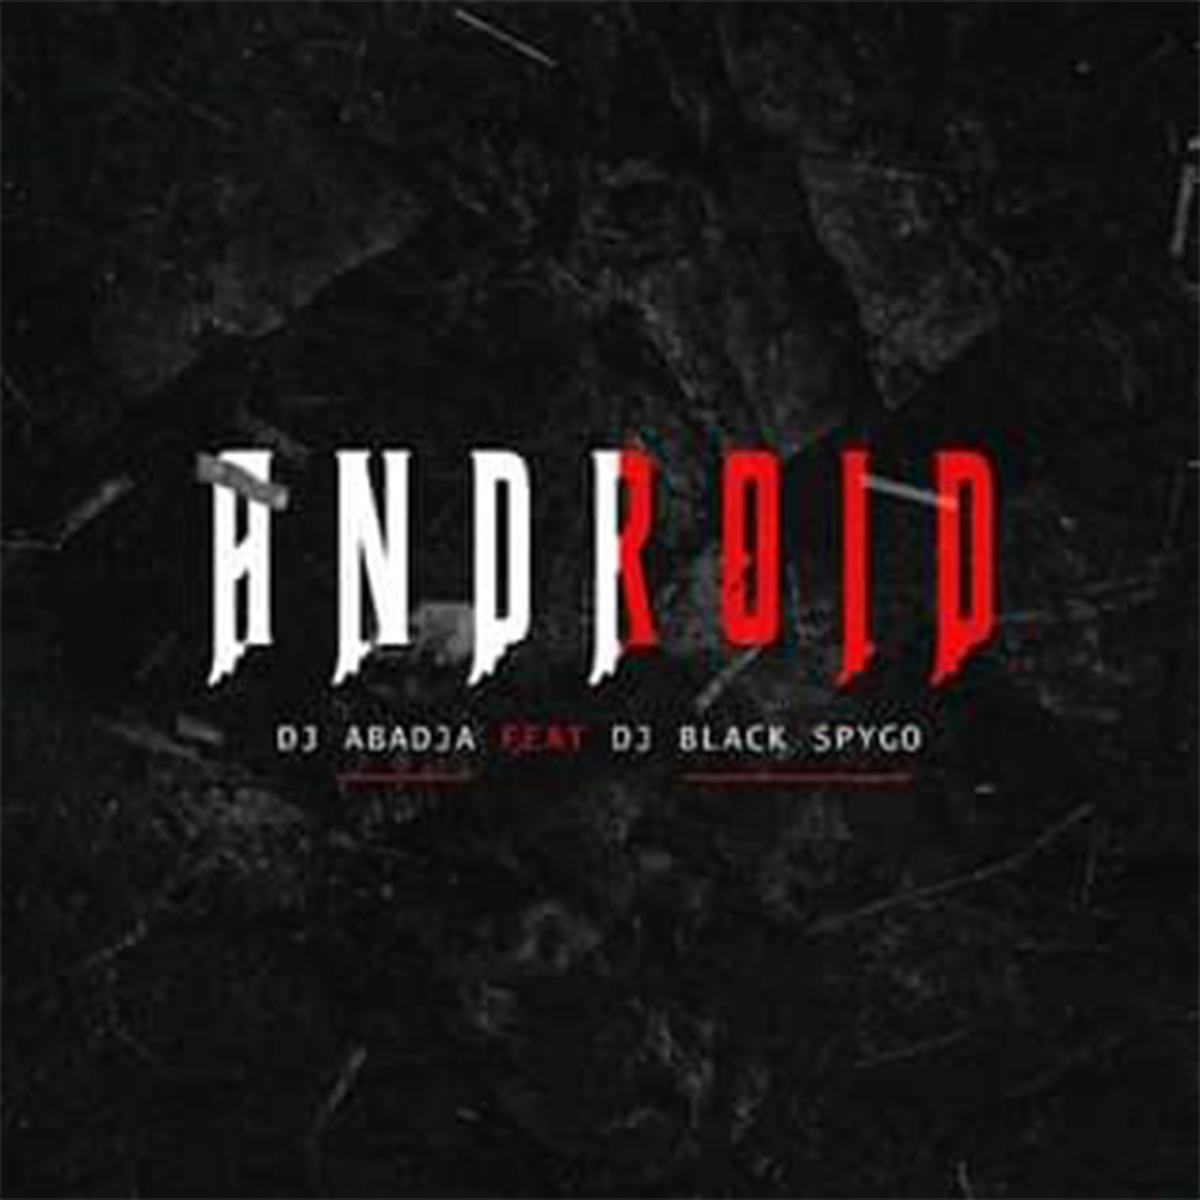 Dj Abadja - Android (feat. Dj Black Spigo)